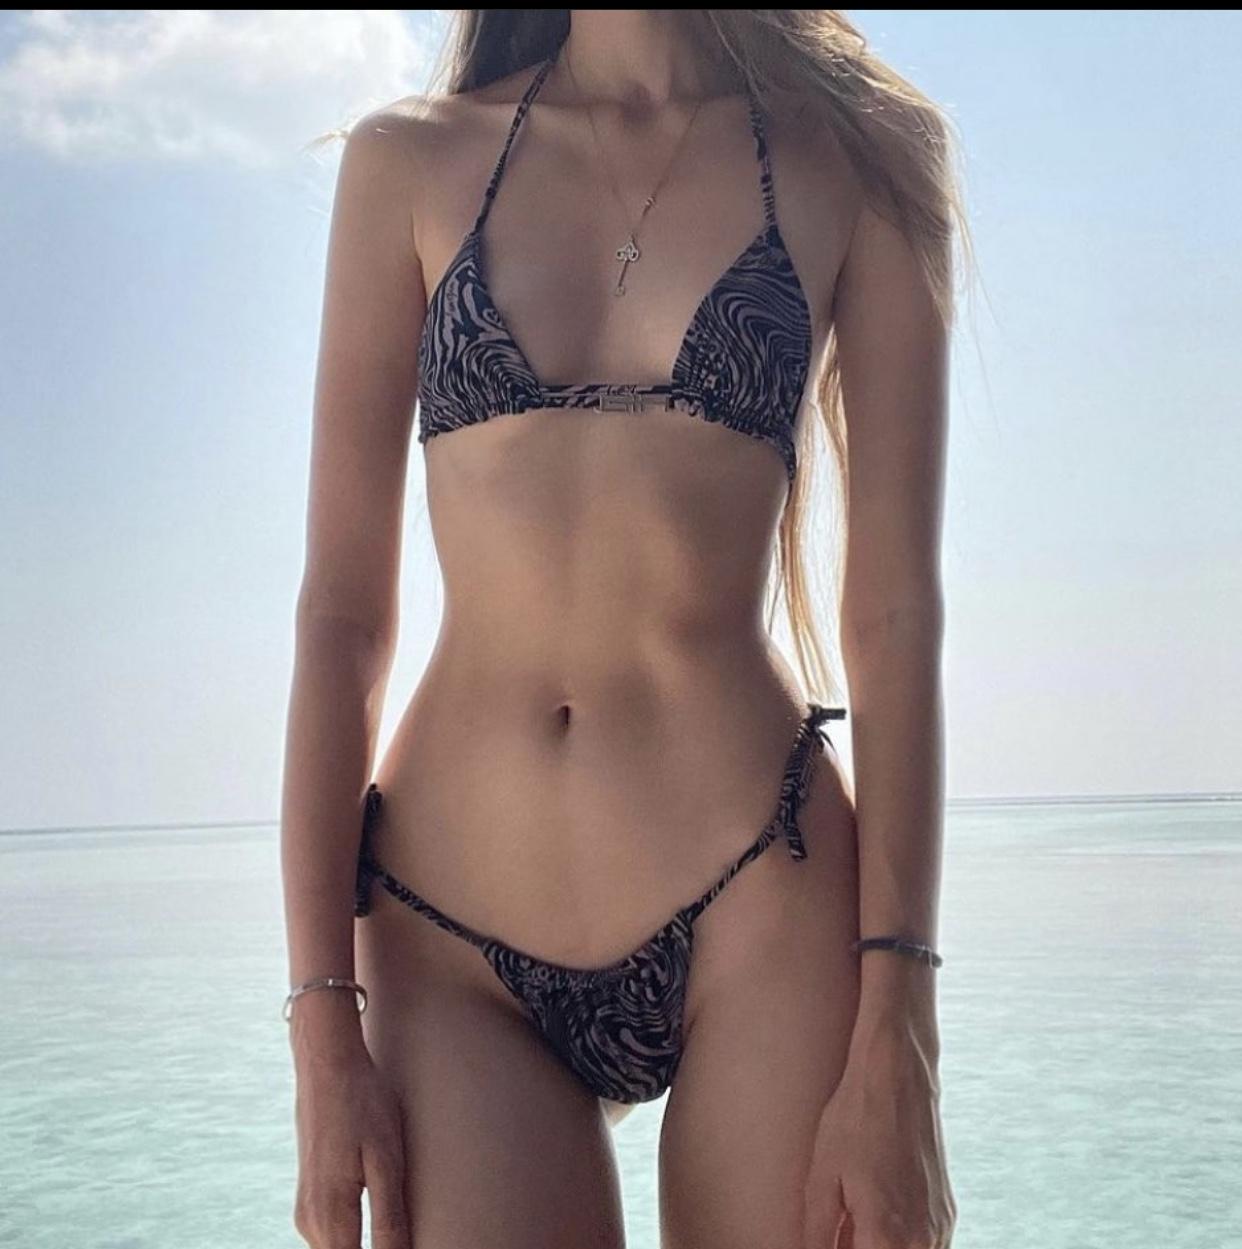 ana, article, and skinny image